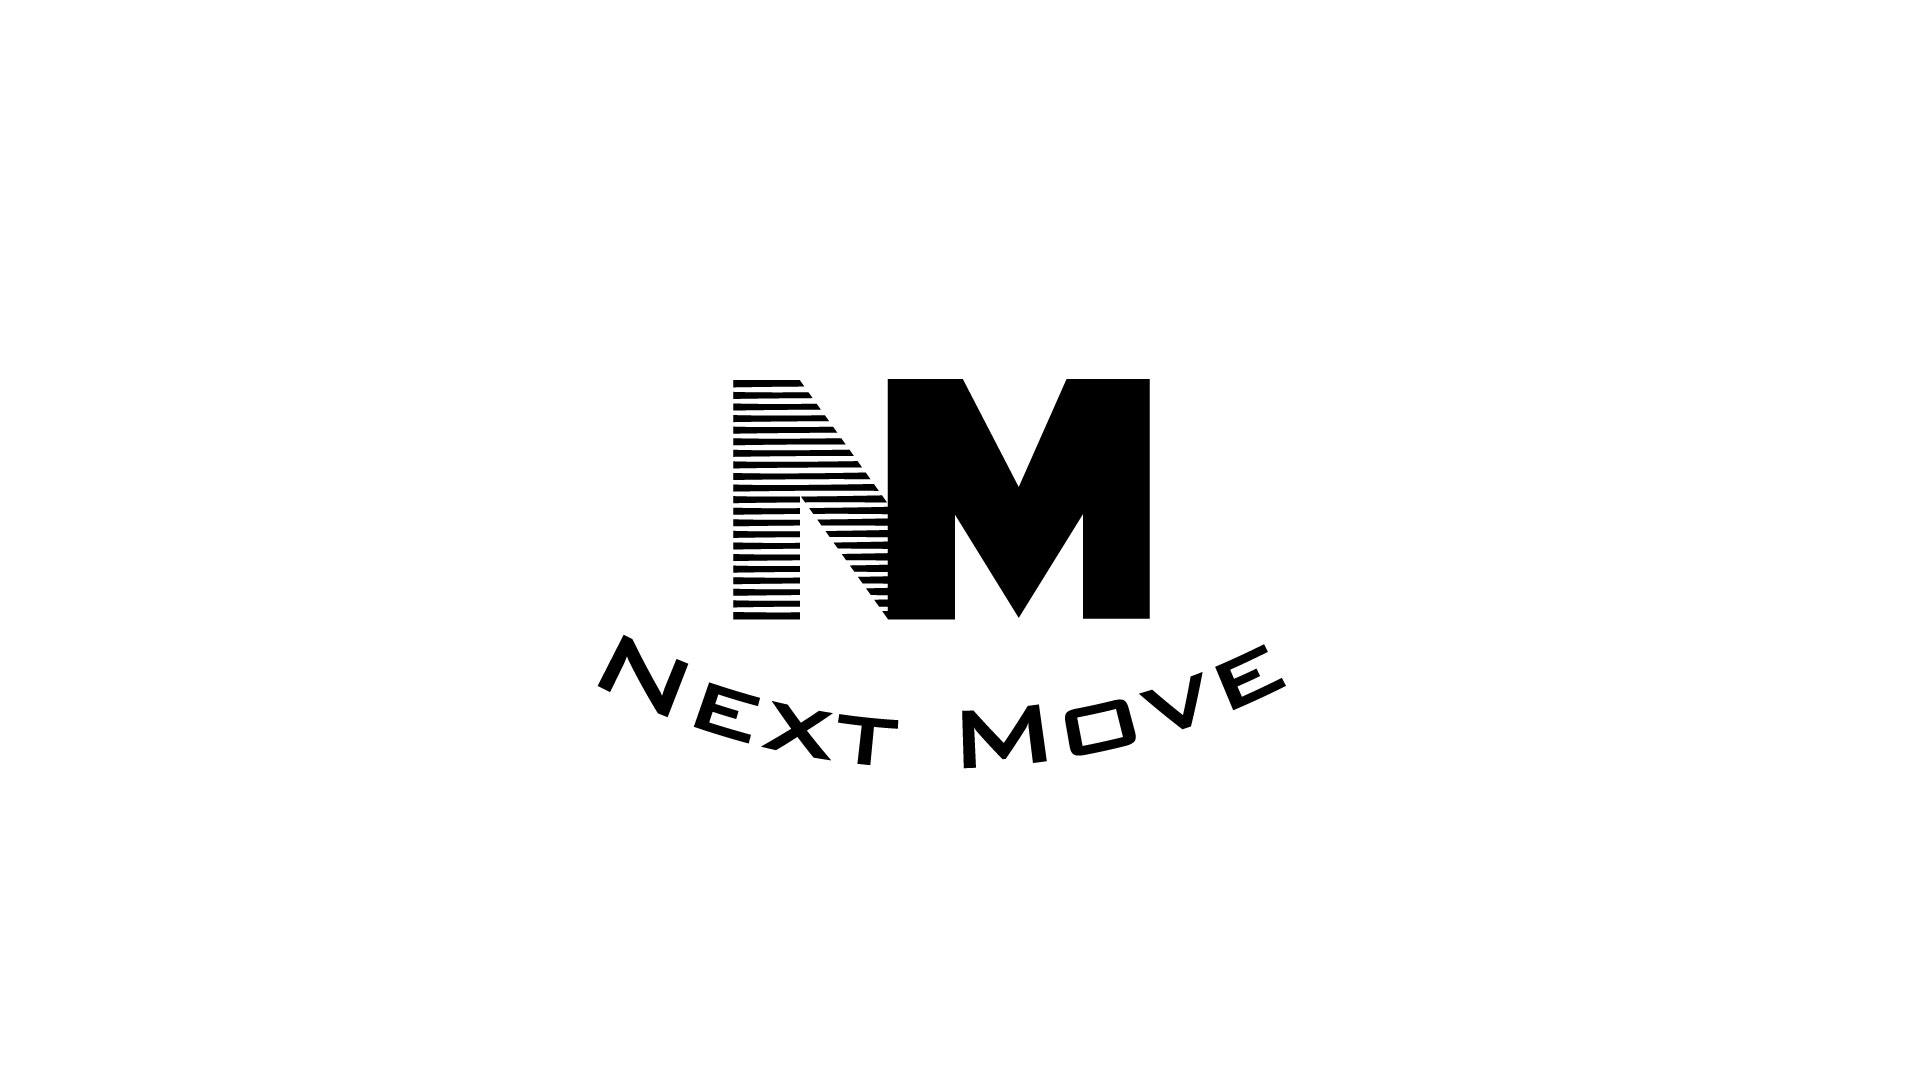 Next-move-final